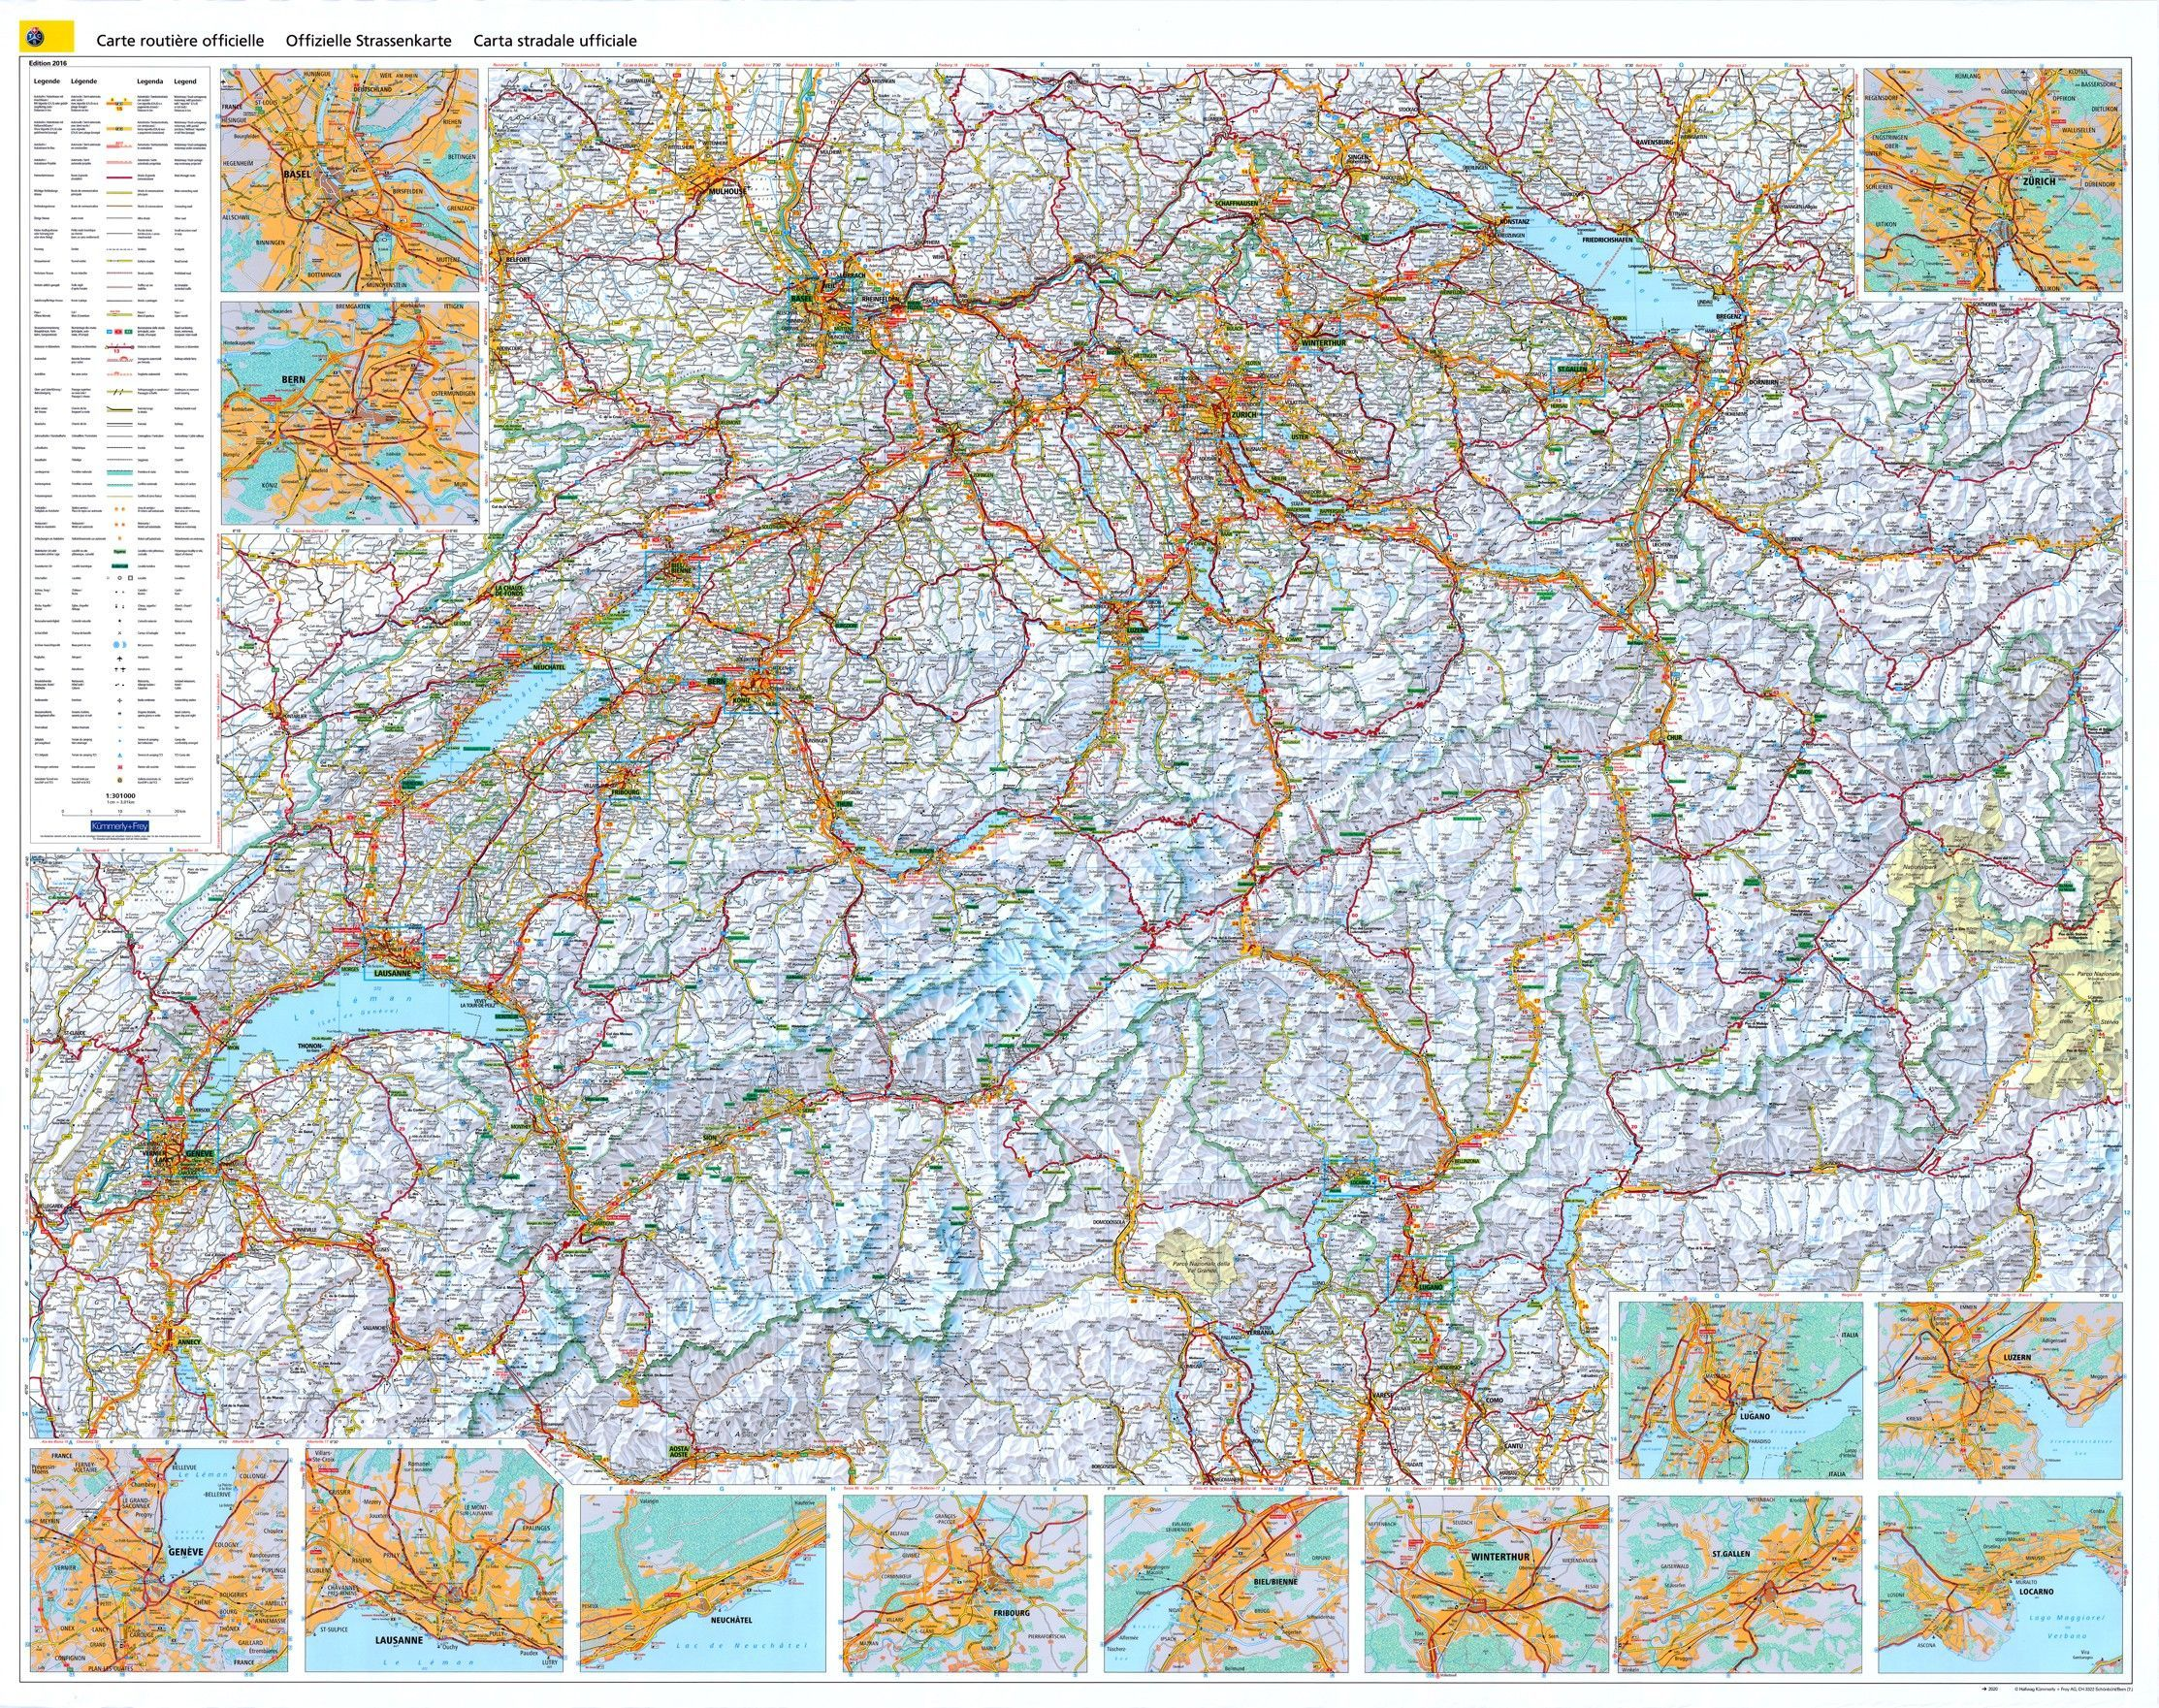 Landkarte Schweiz 1:303.000 mit platz namen index - Commee Landkarten